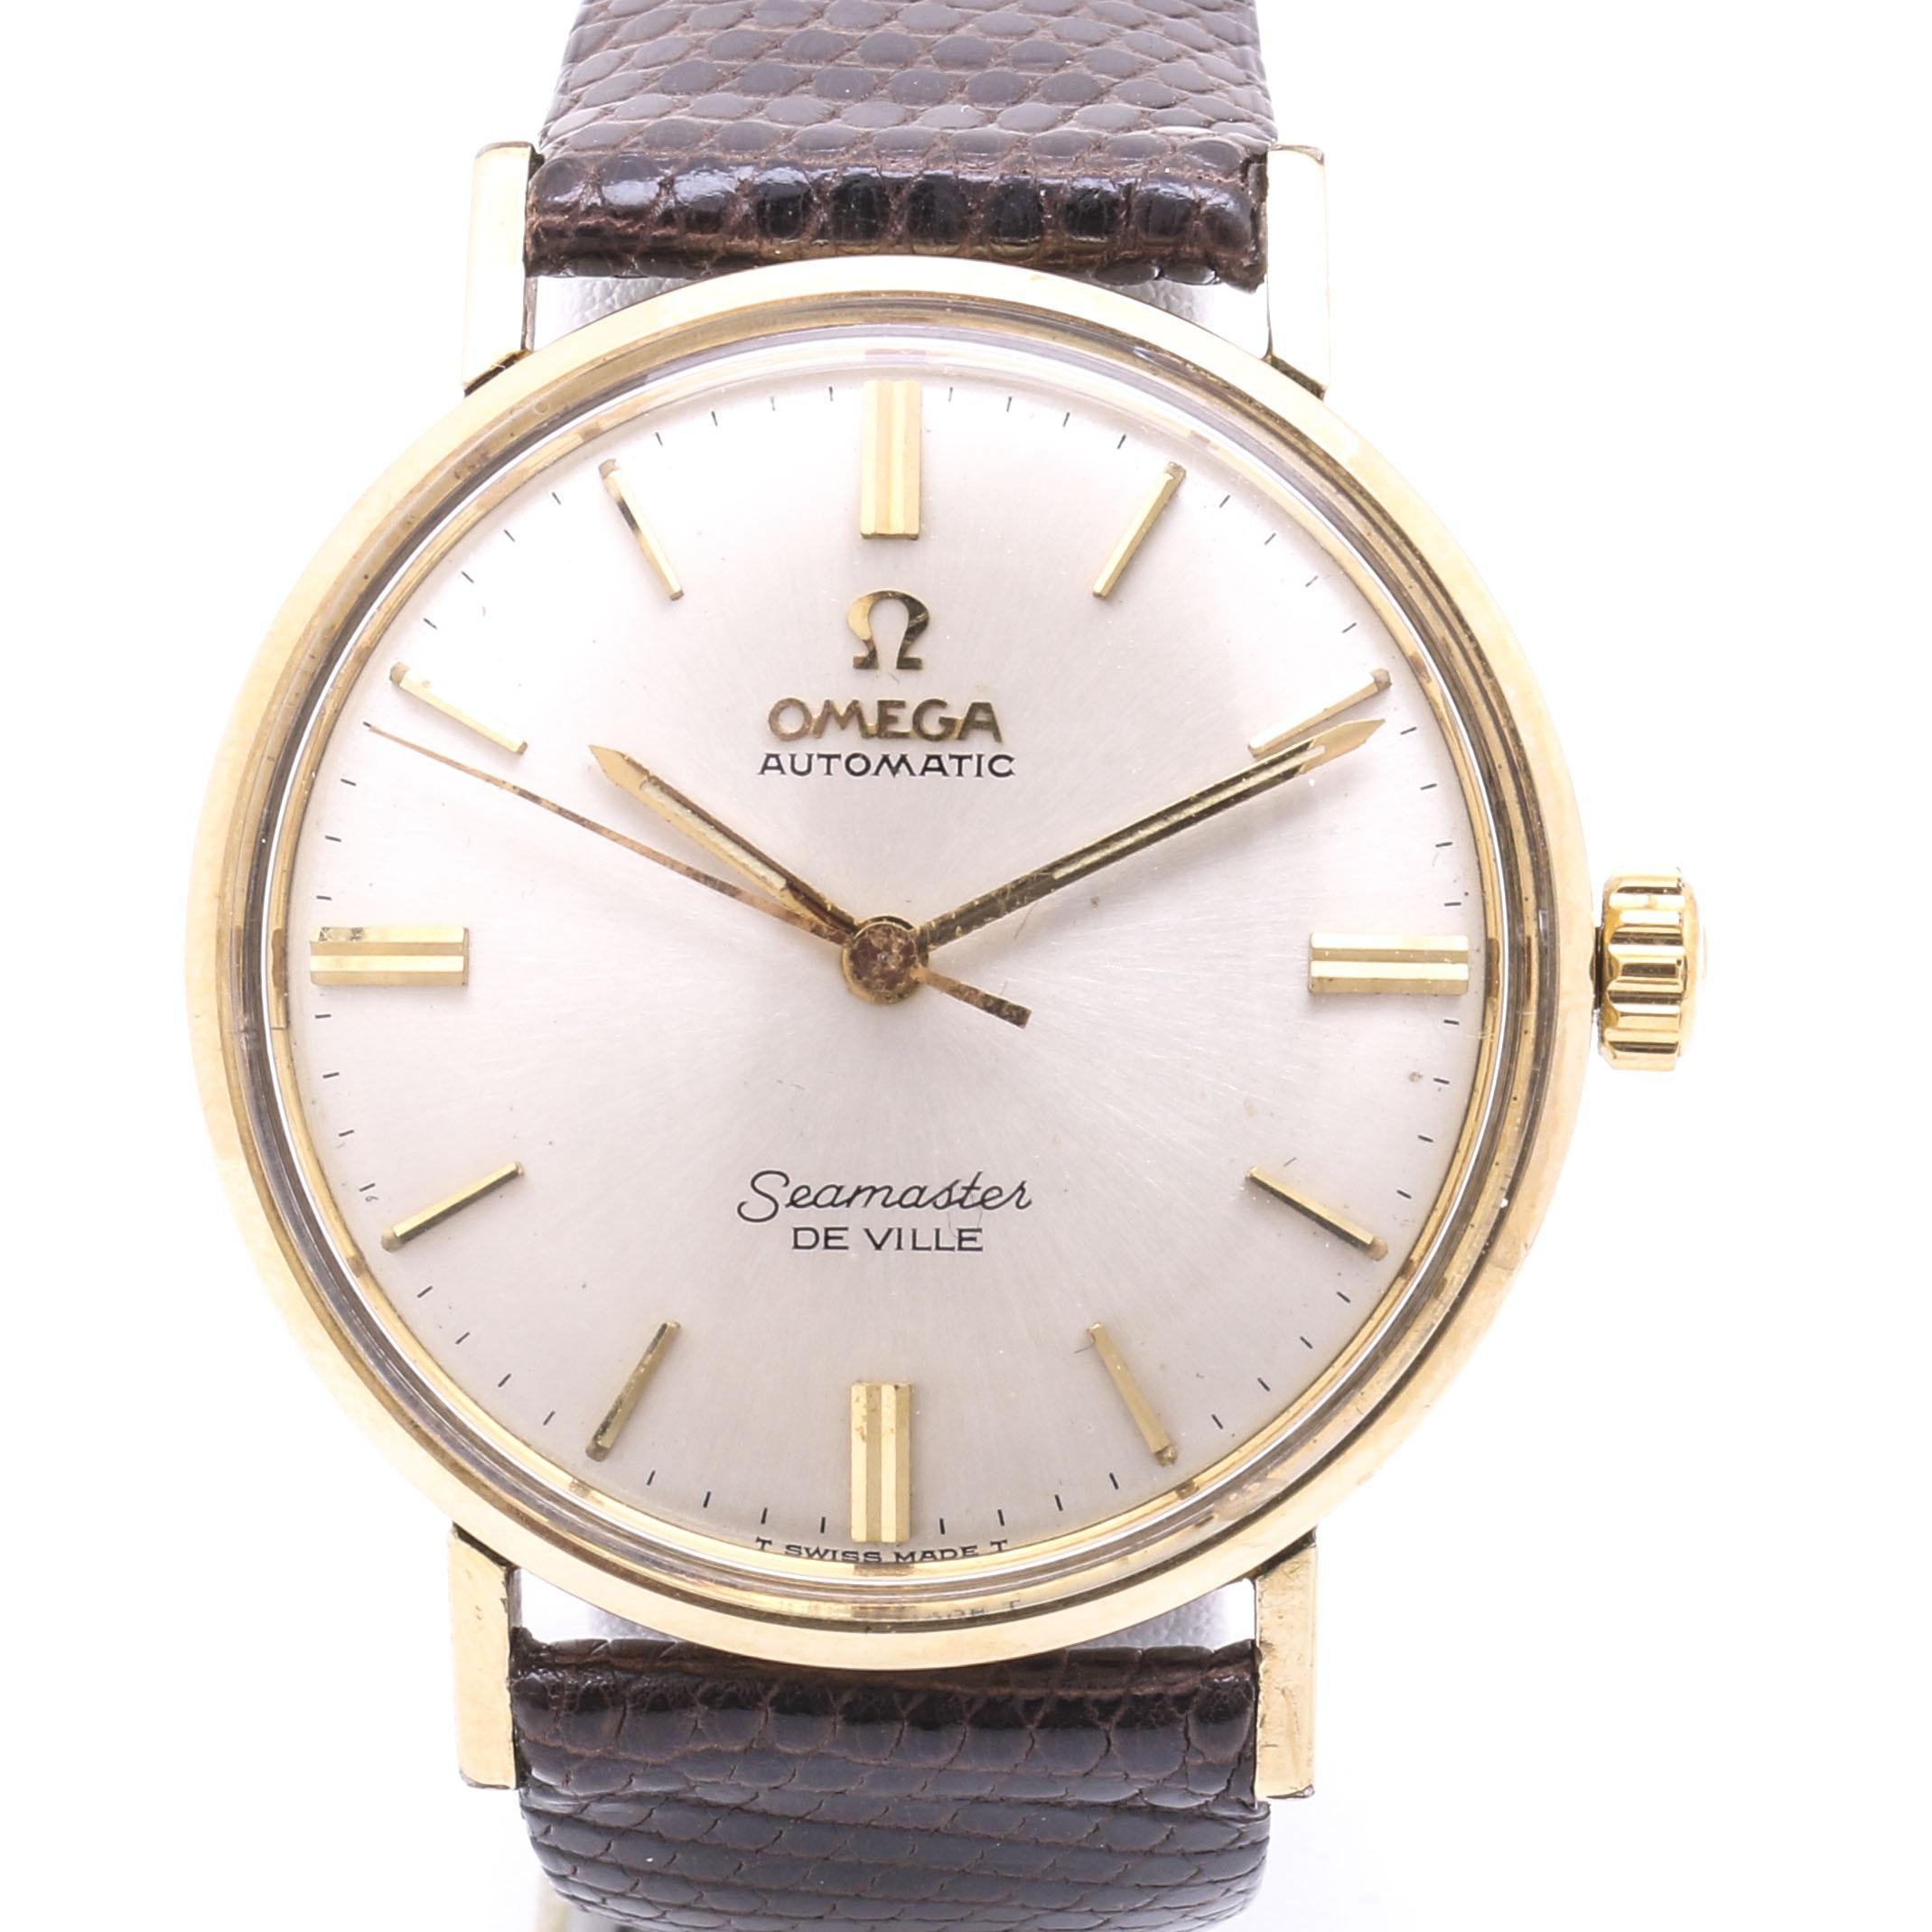 Omega Automatic Seamaster De Ville Wristwatch